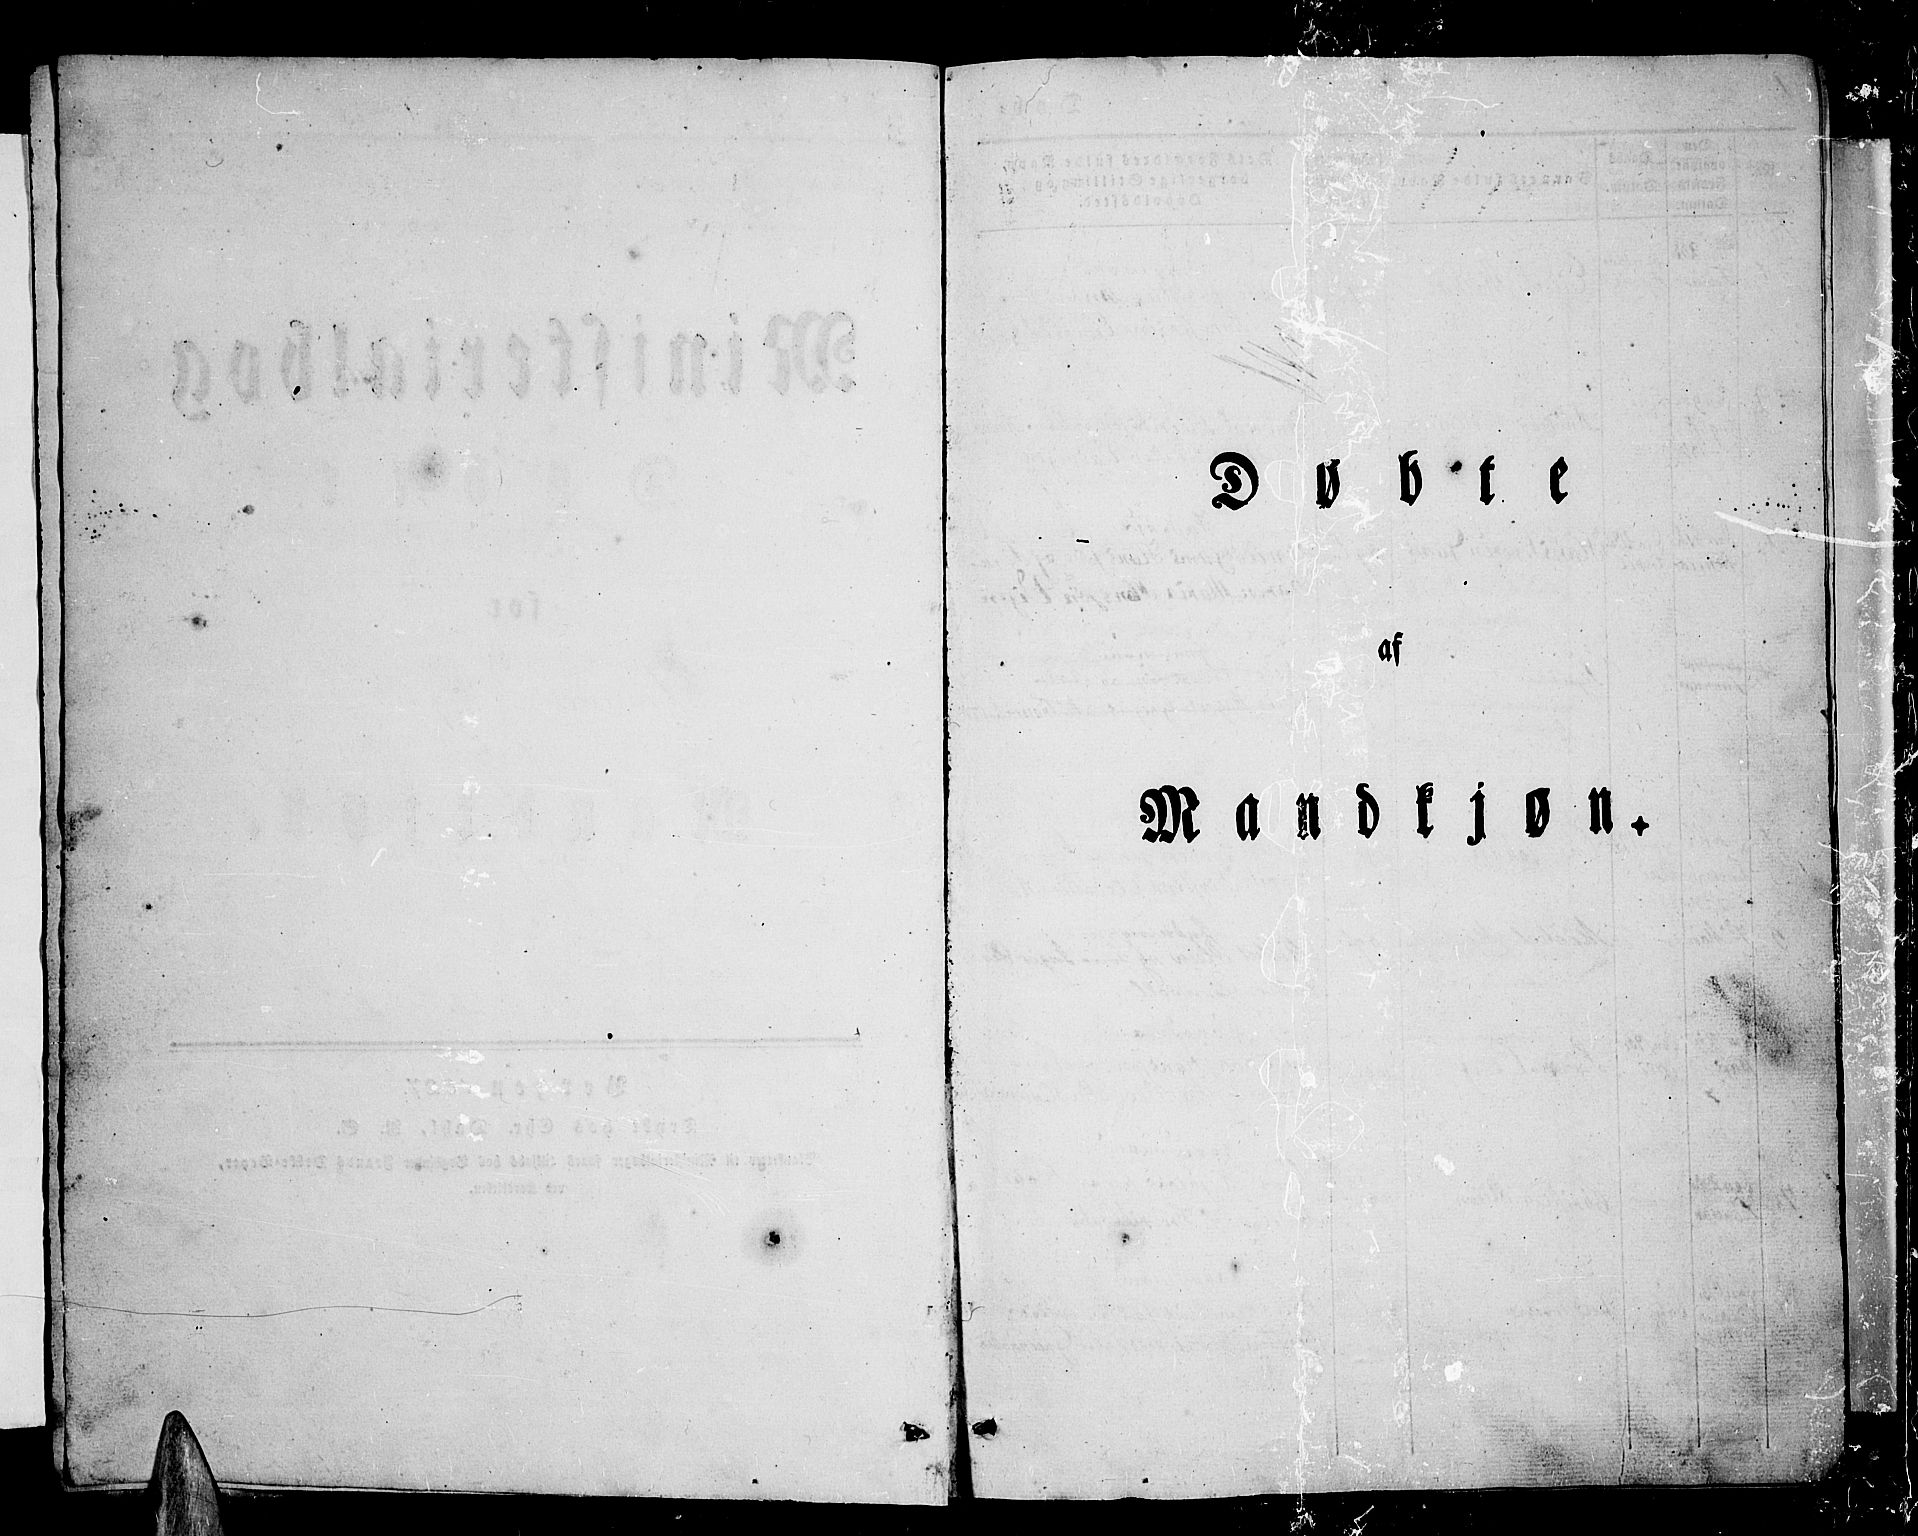 SATØ, Tranøy sokneprestkontor, I/Ia/Iab/L0001klokker: Klokkerbok nr. 1, 1835-1853